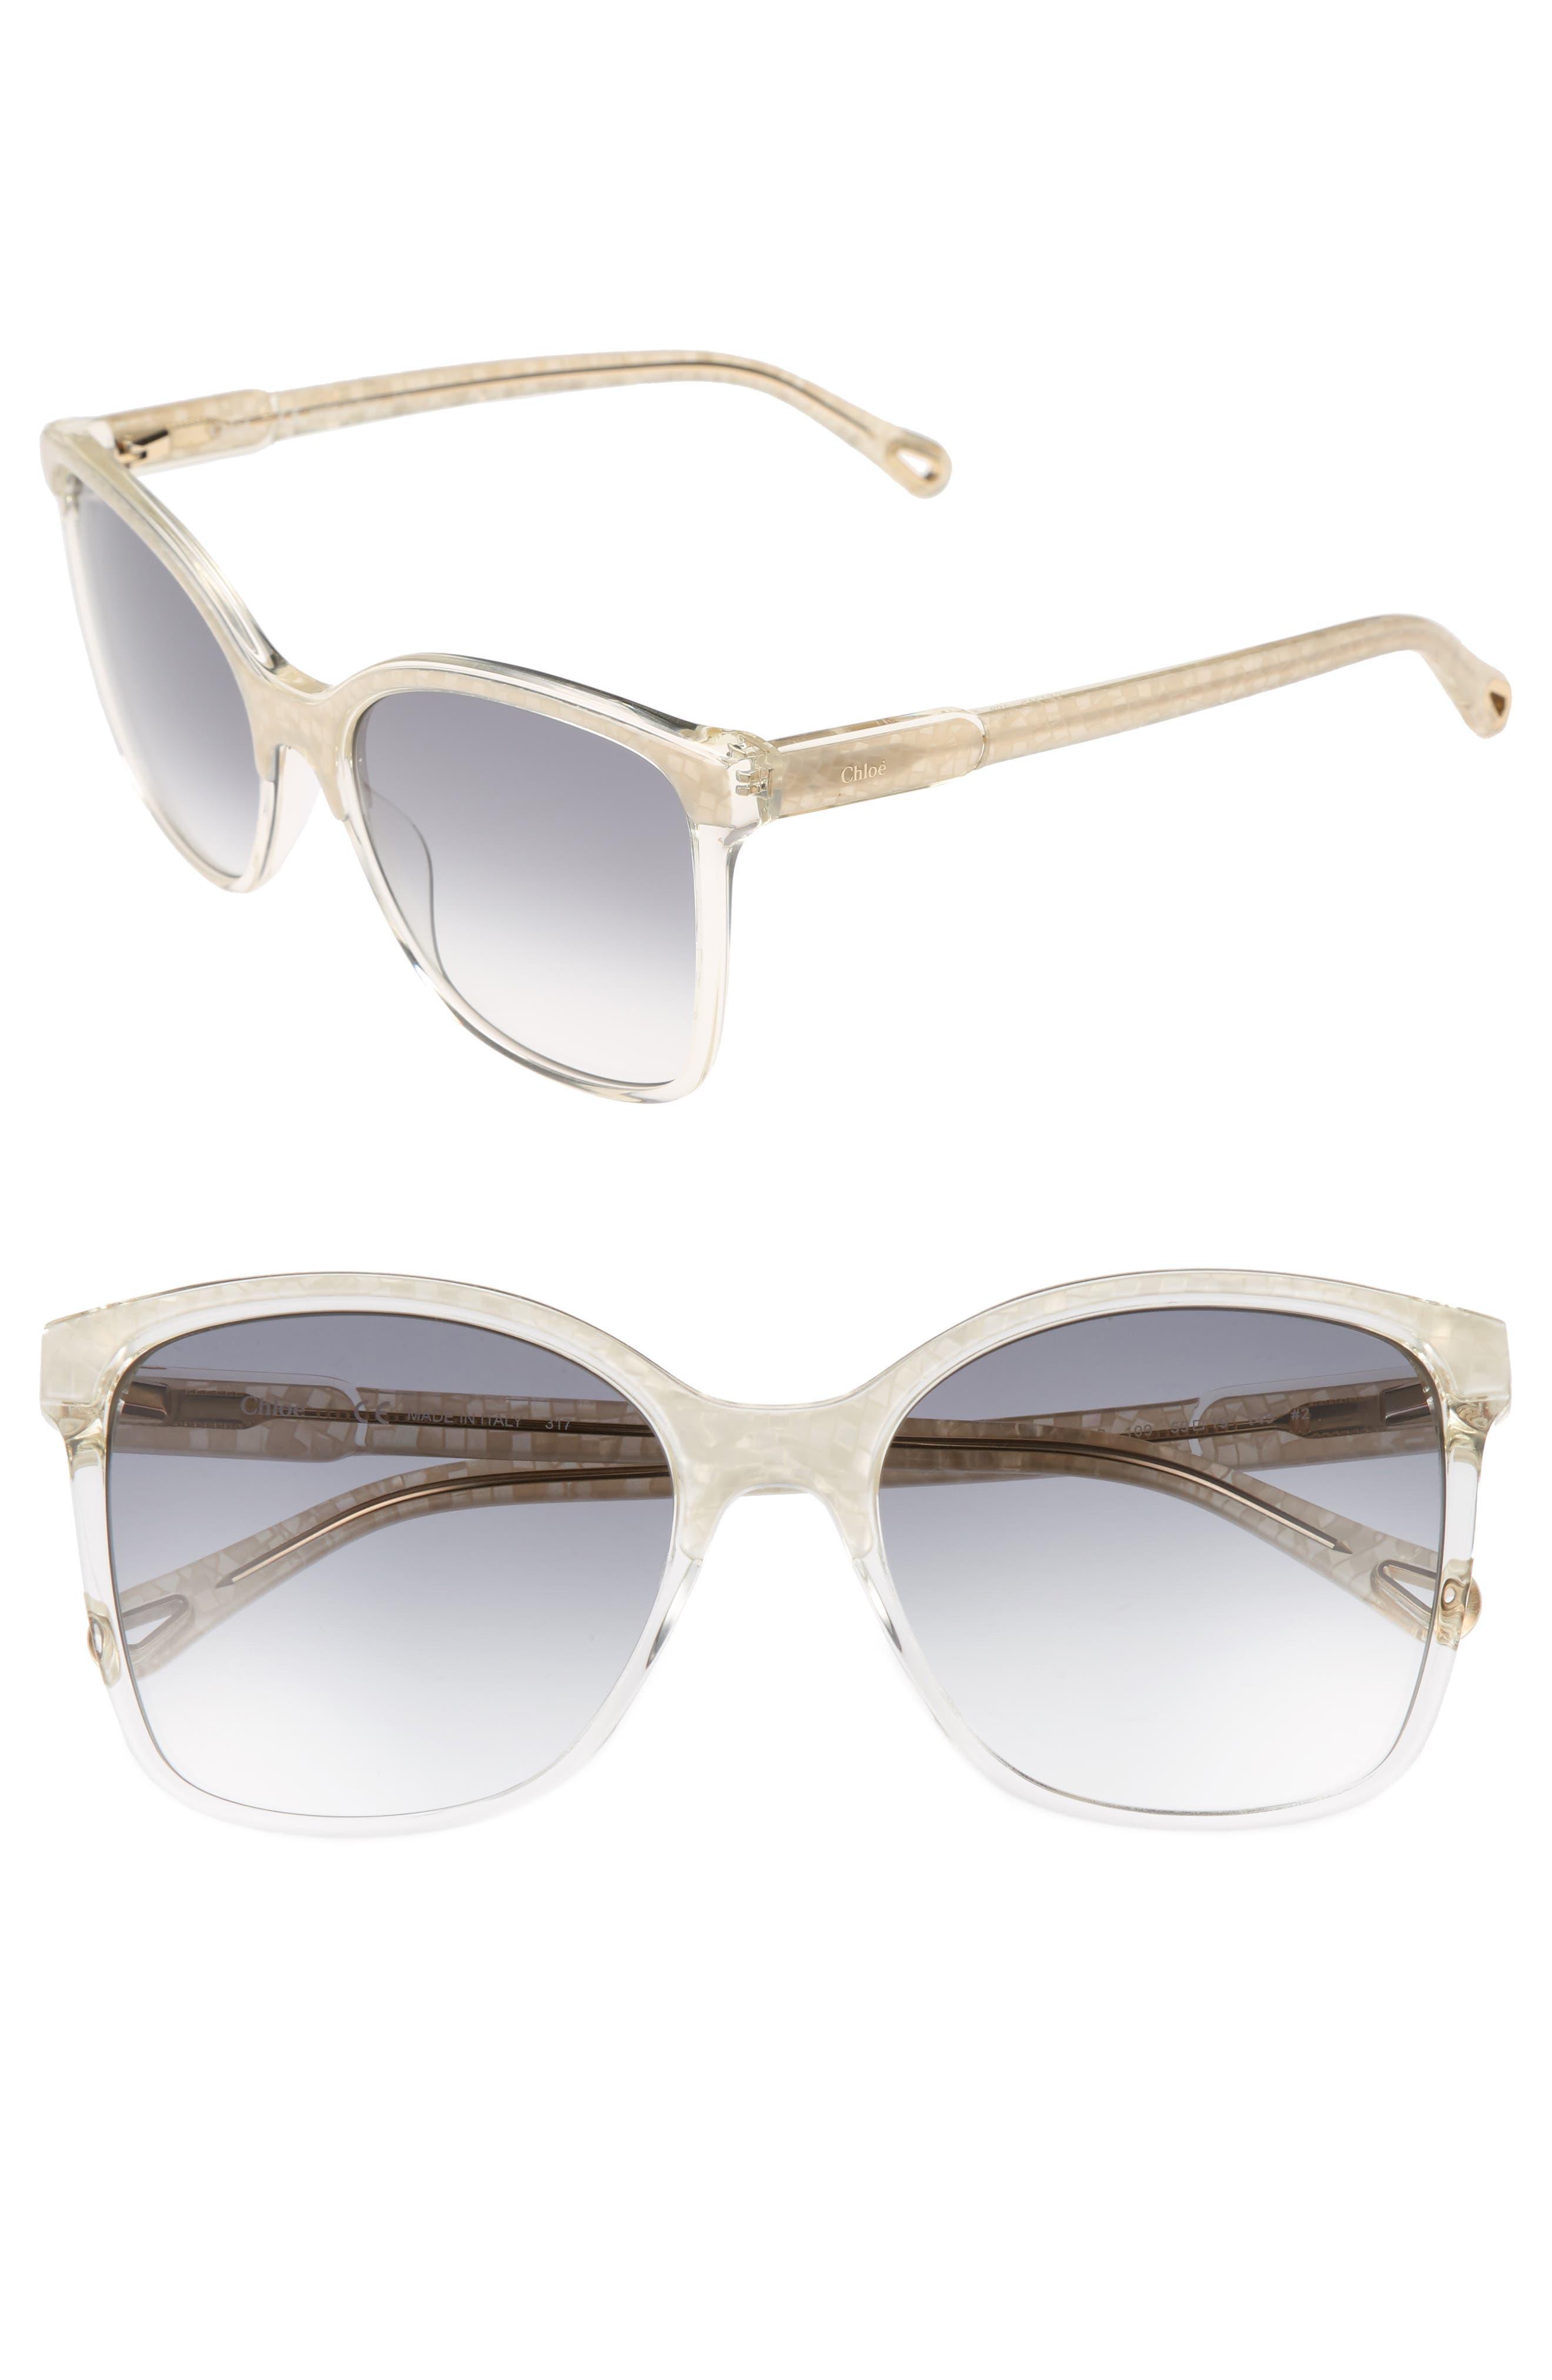 59mm Brow Bar Sunglasses,                             Main thumbnail 1, color,                             Pearl/ Champagne